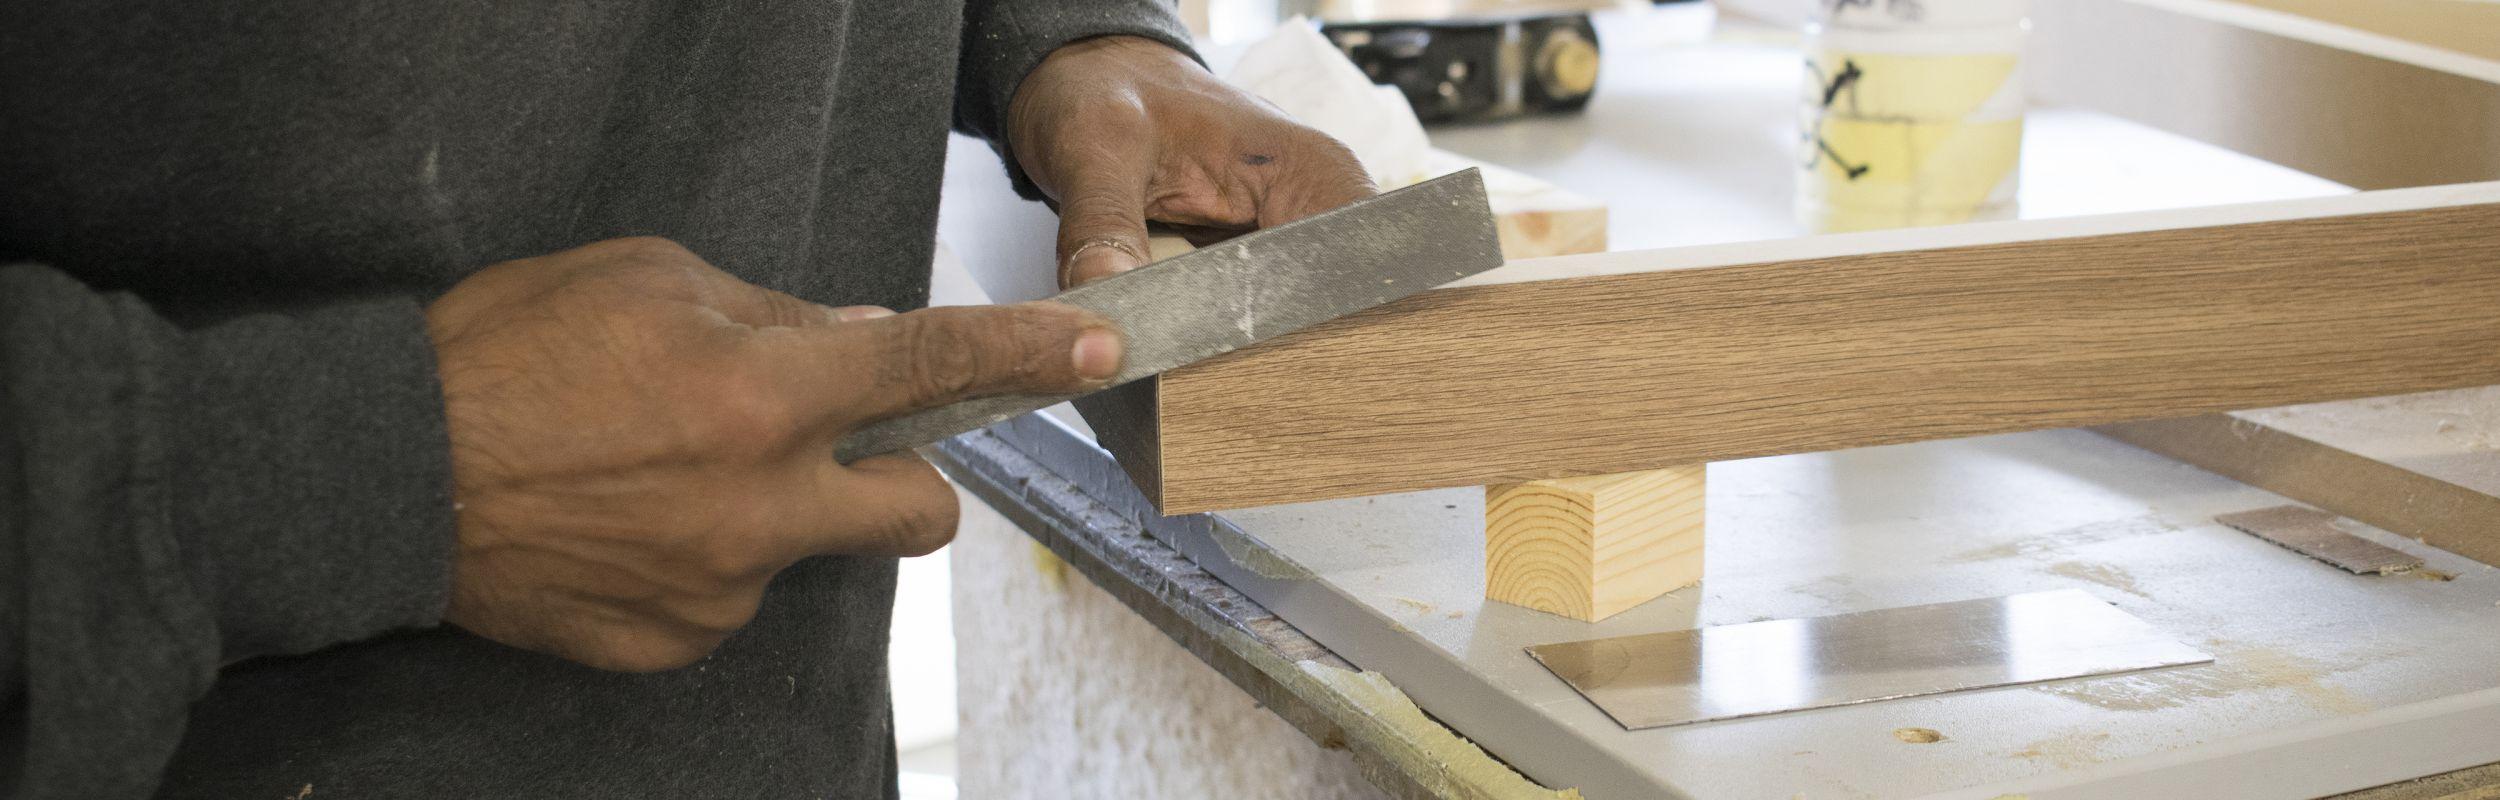 hand finishing wood bespoke joinery